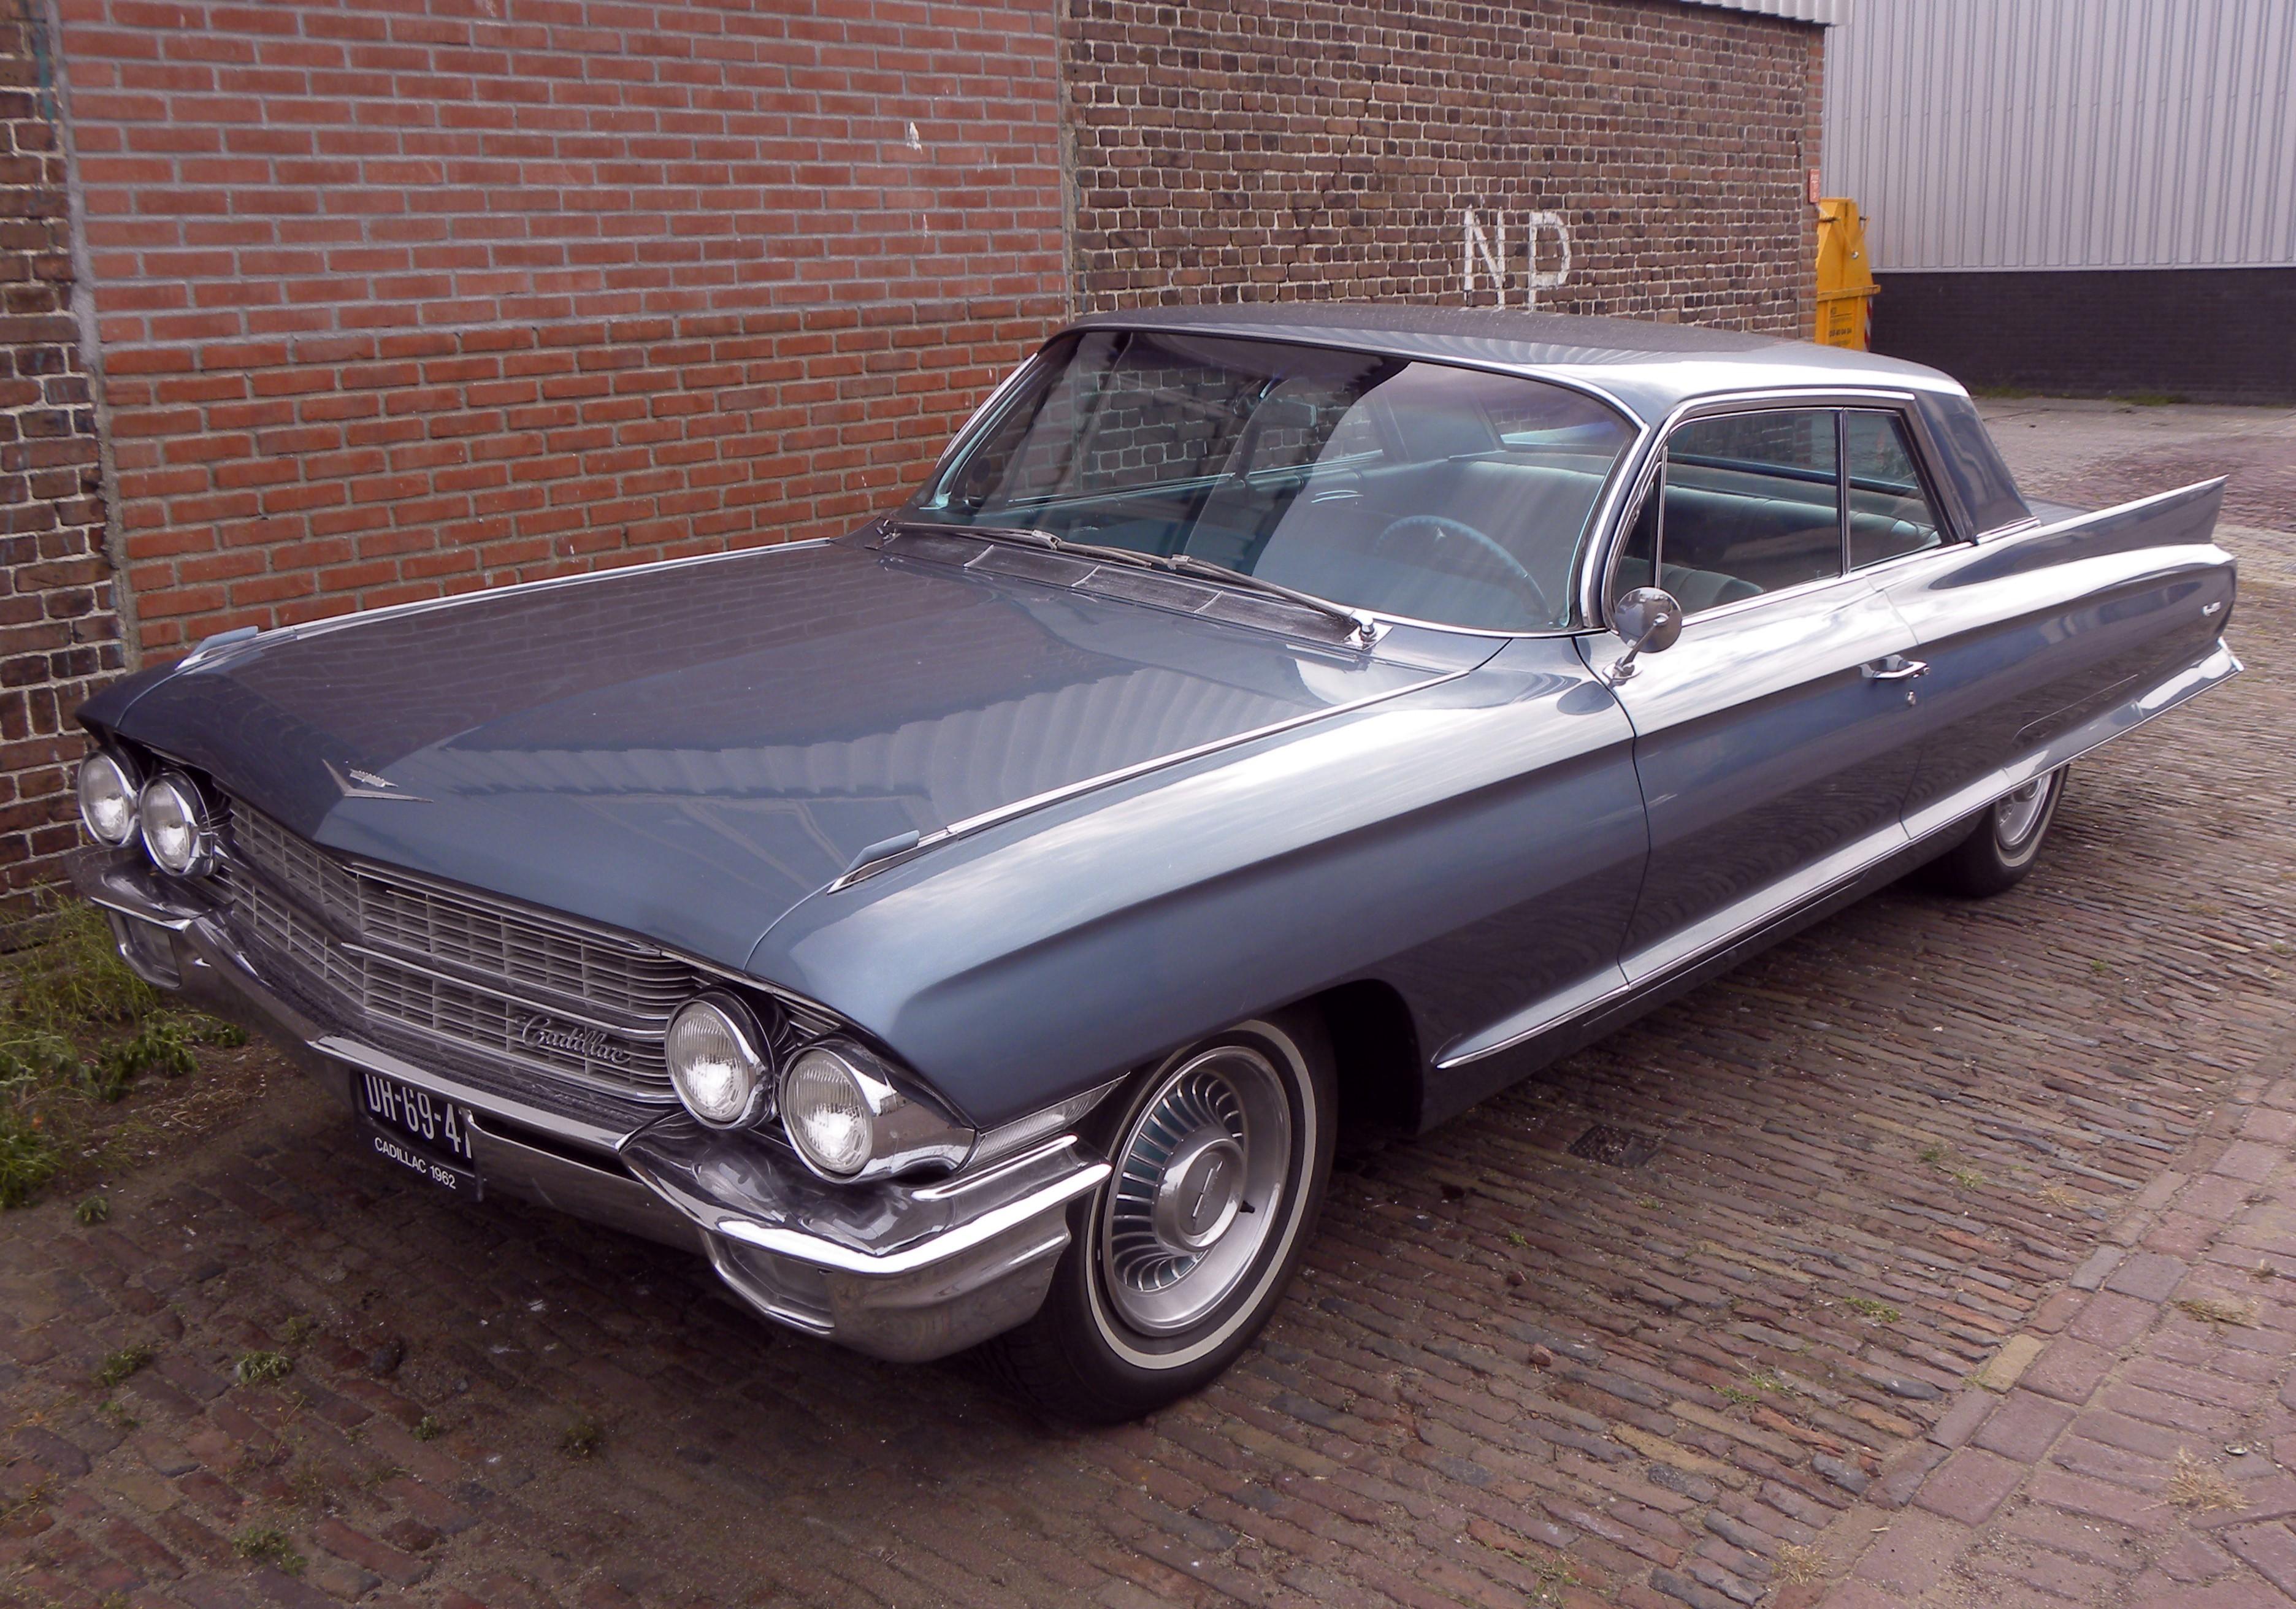 File:Cadillac coupe de ville 1962.jpg - Wikimedia Commons